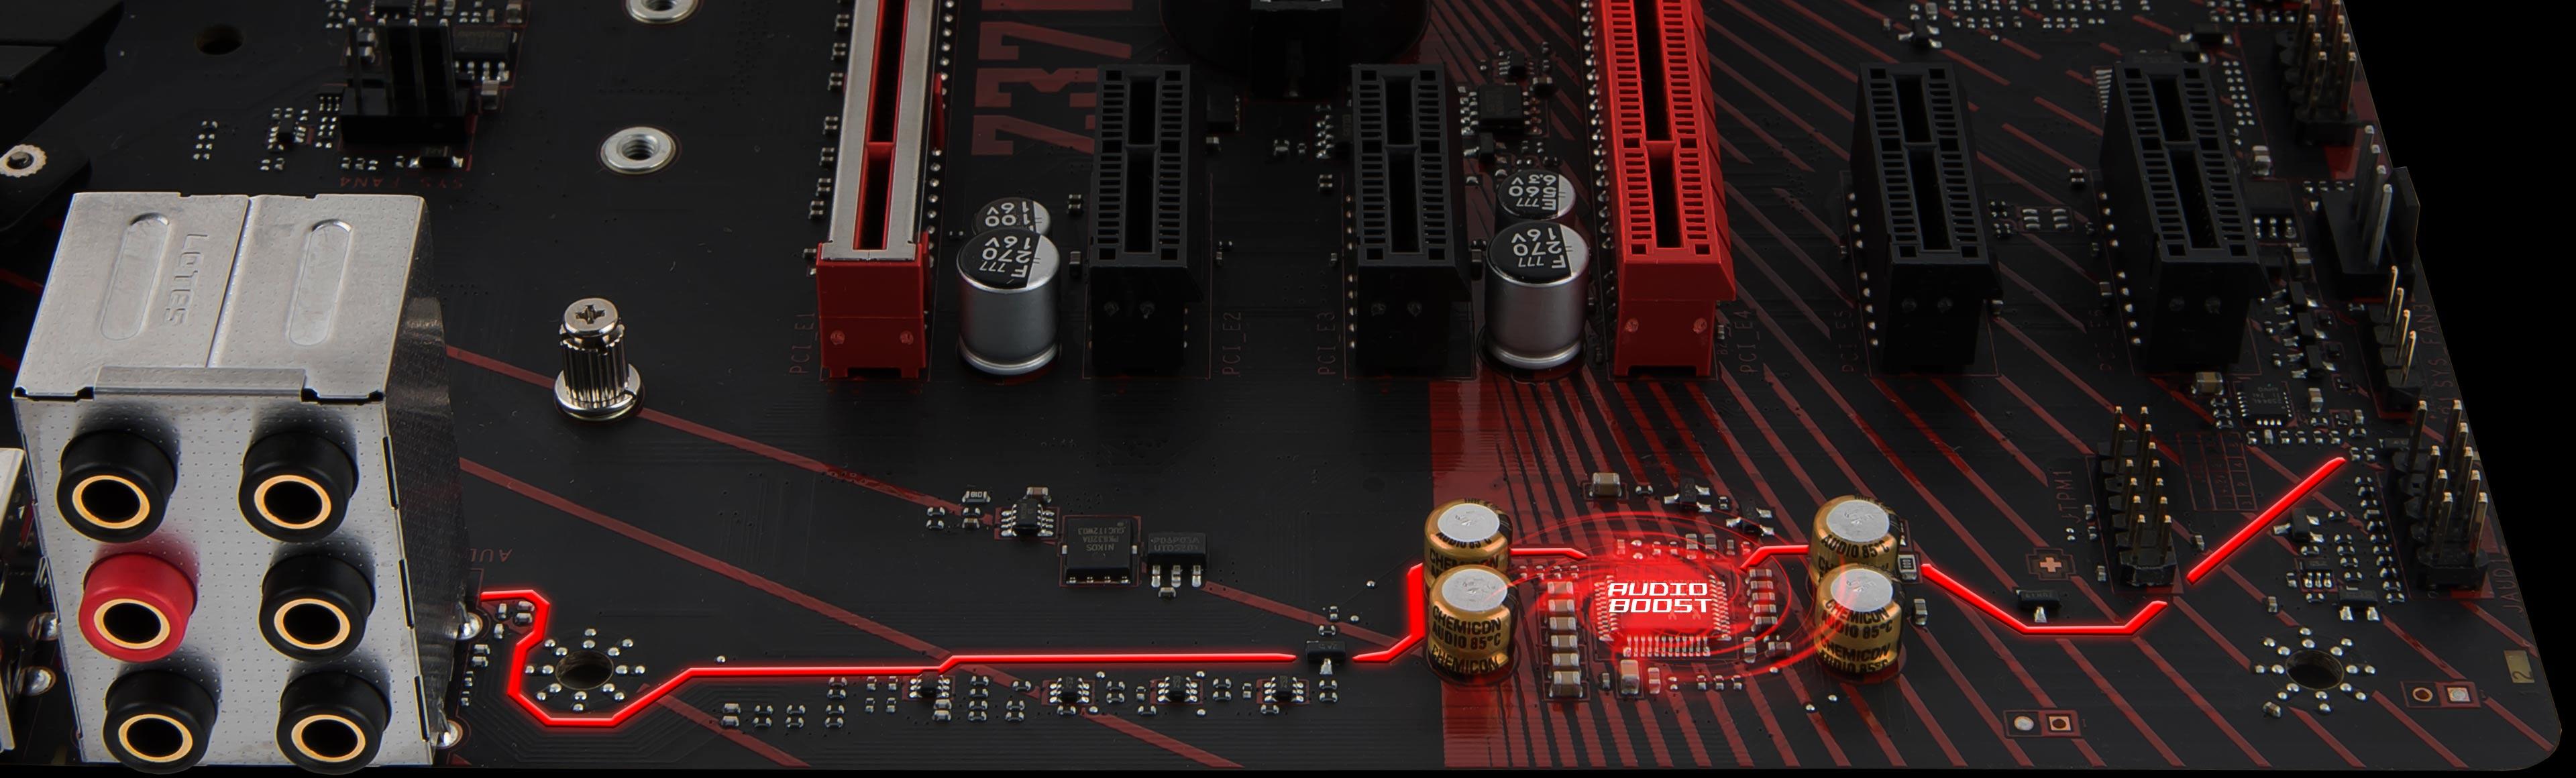 Msi z370 motherboard drivers | Z370 GAMING M5  2019-04-02